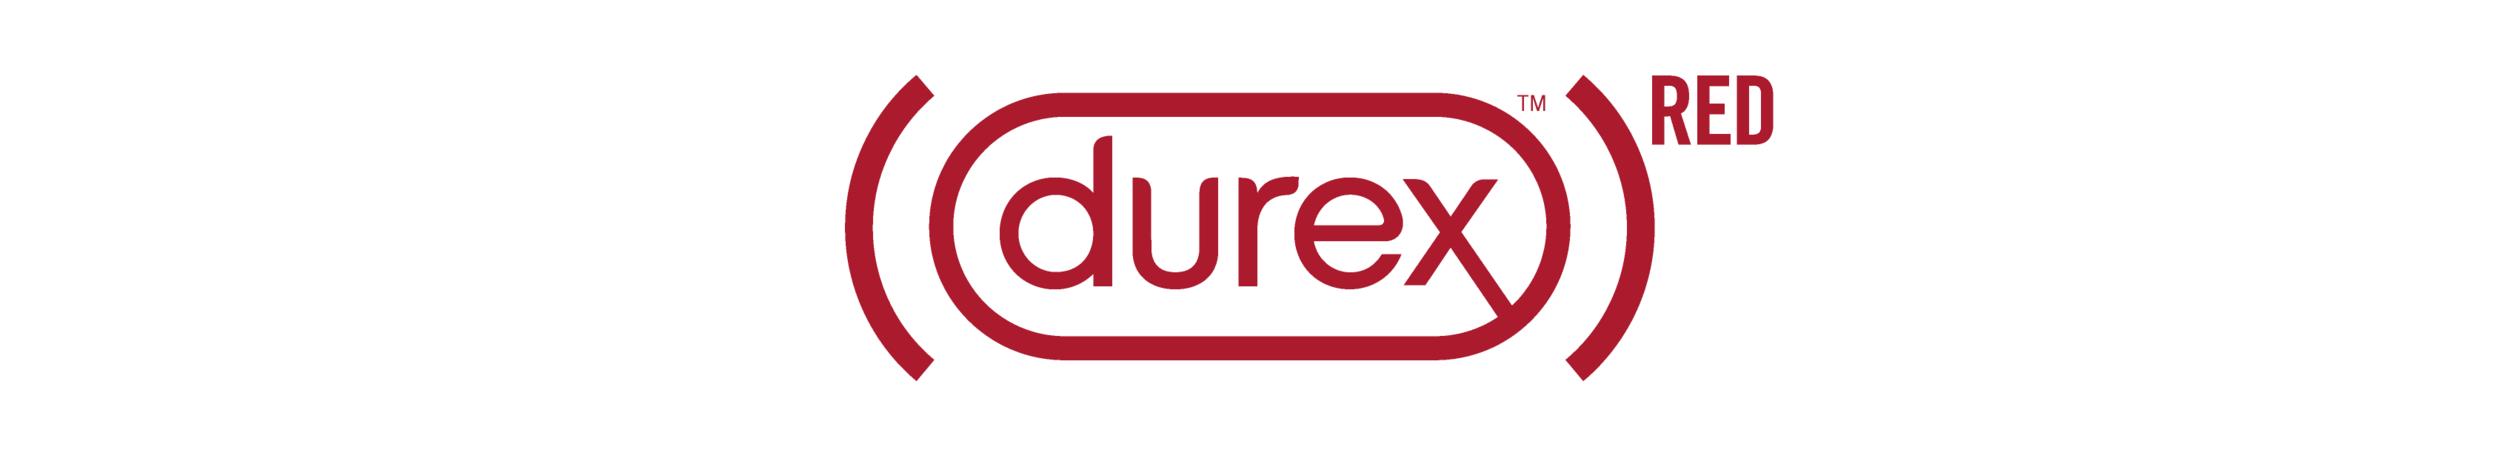 Durex-RED_red.png